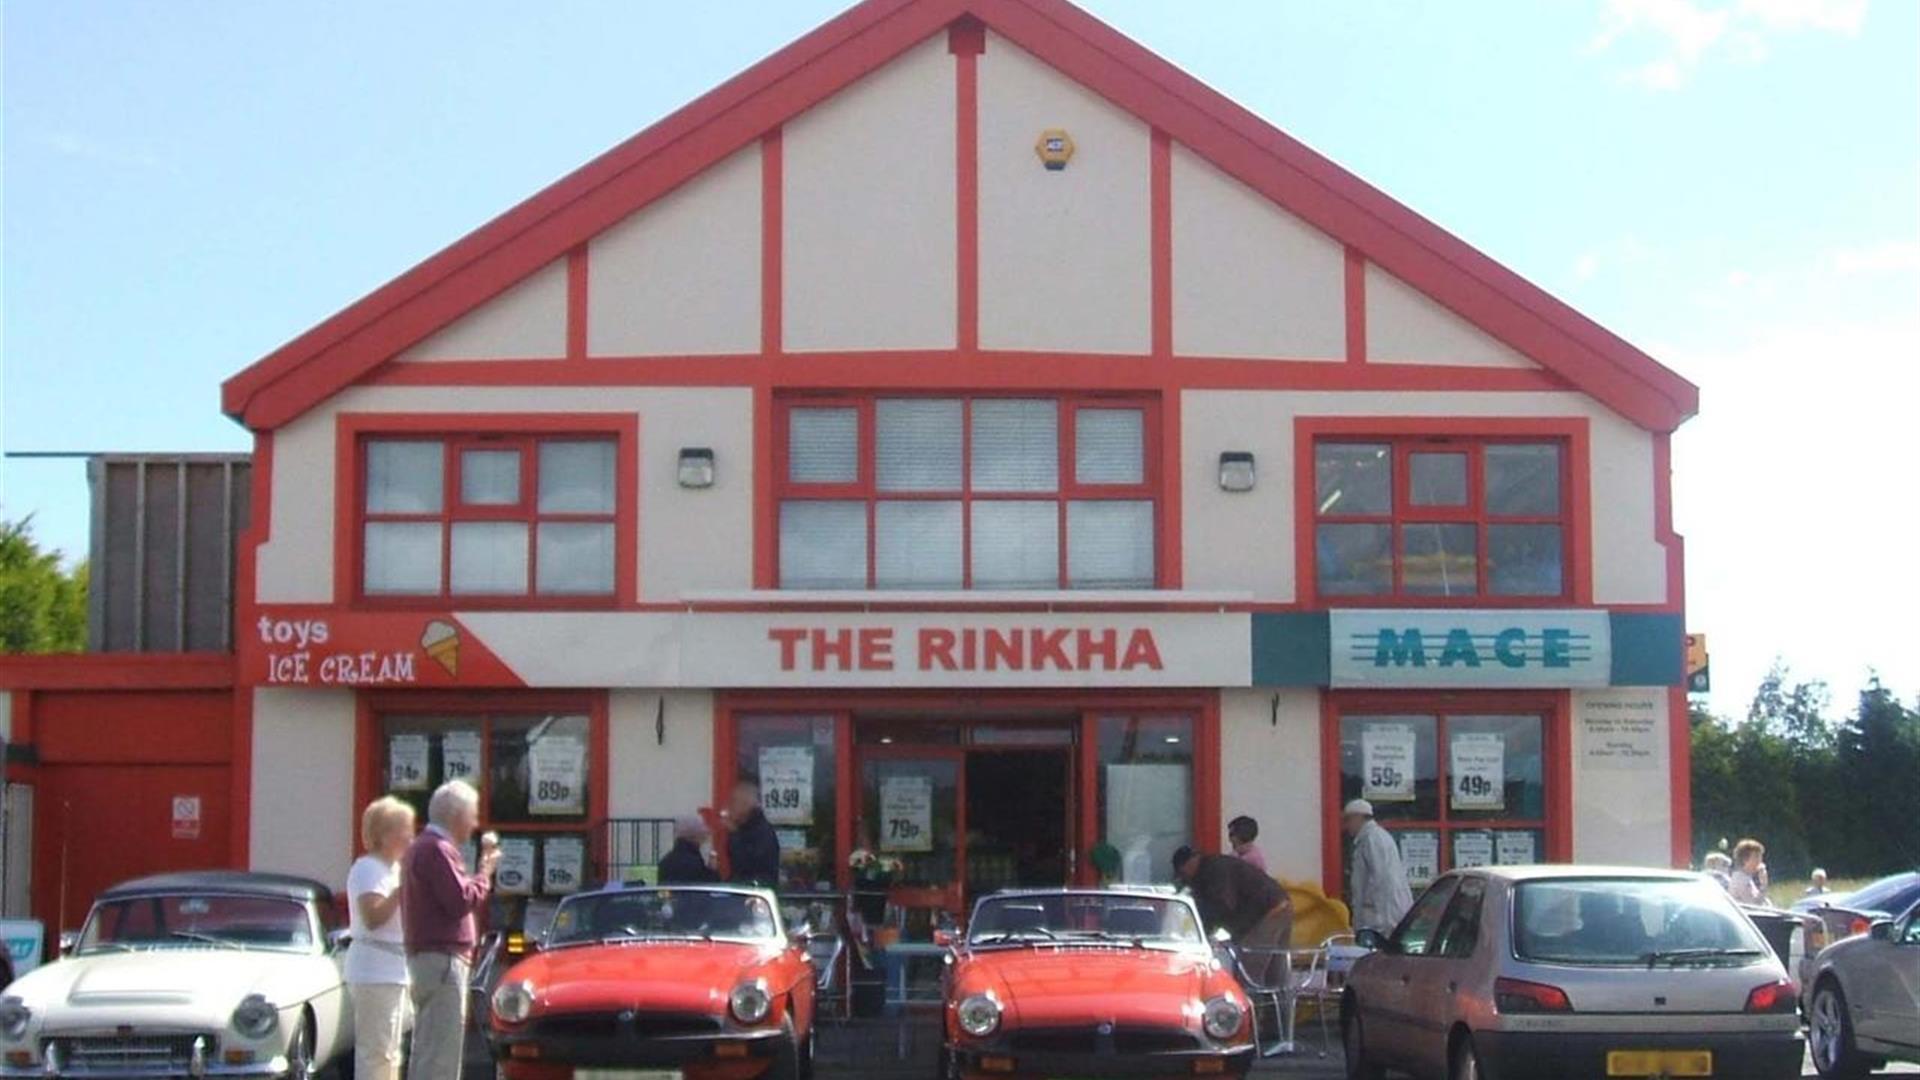 The Rinkha